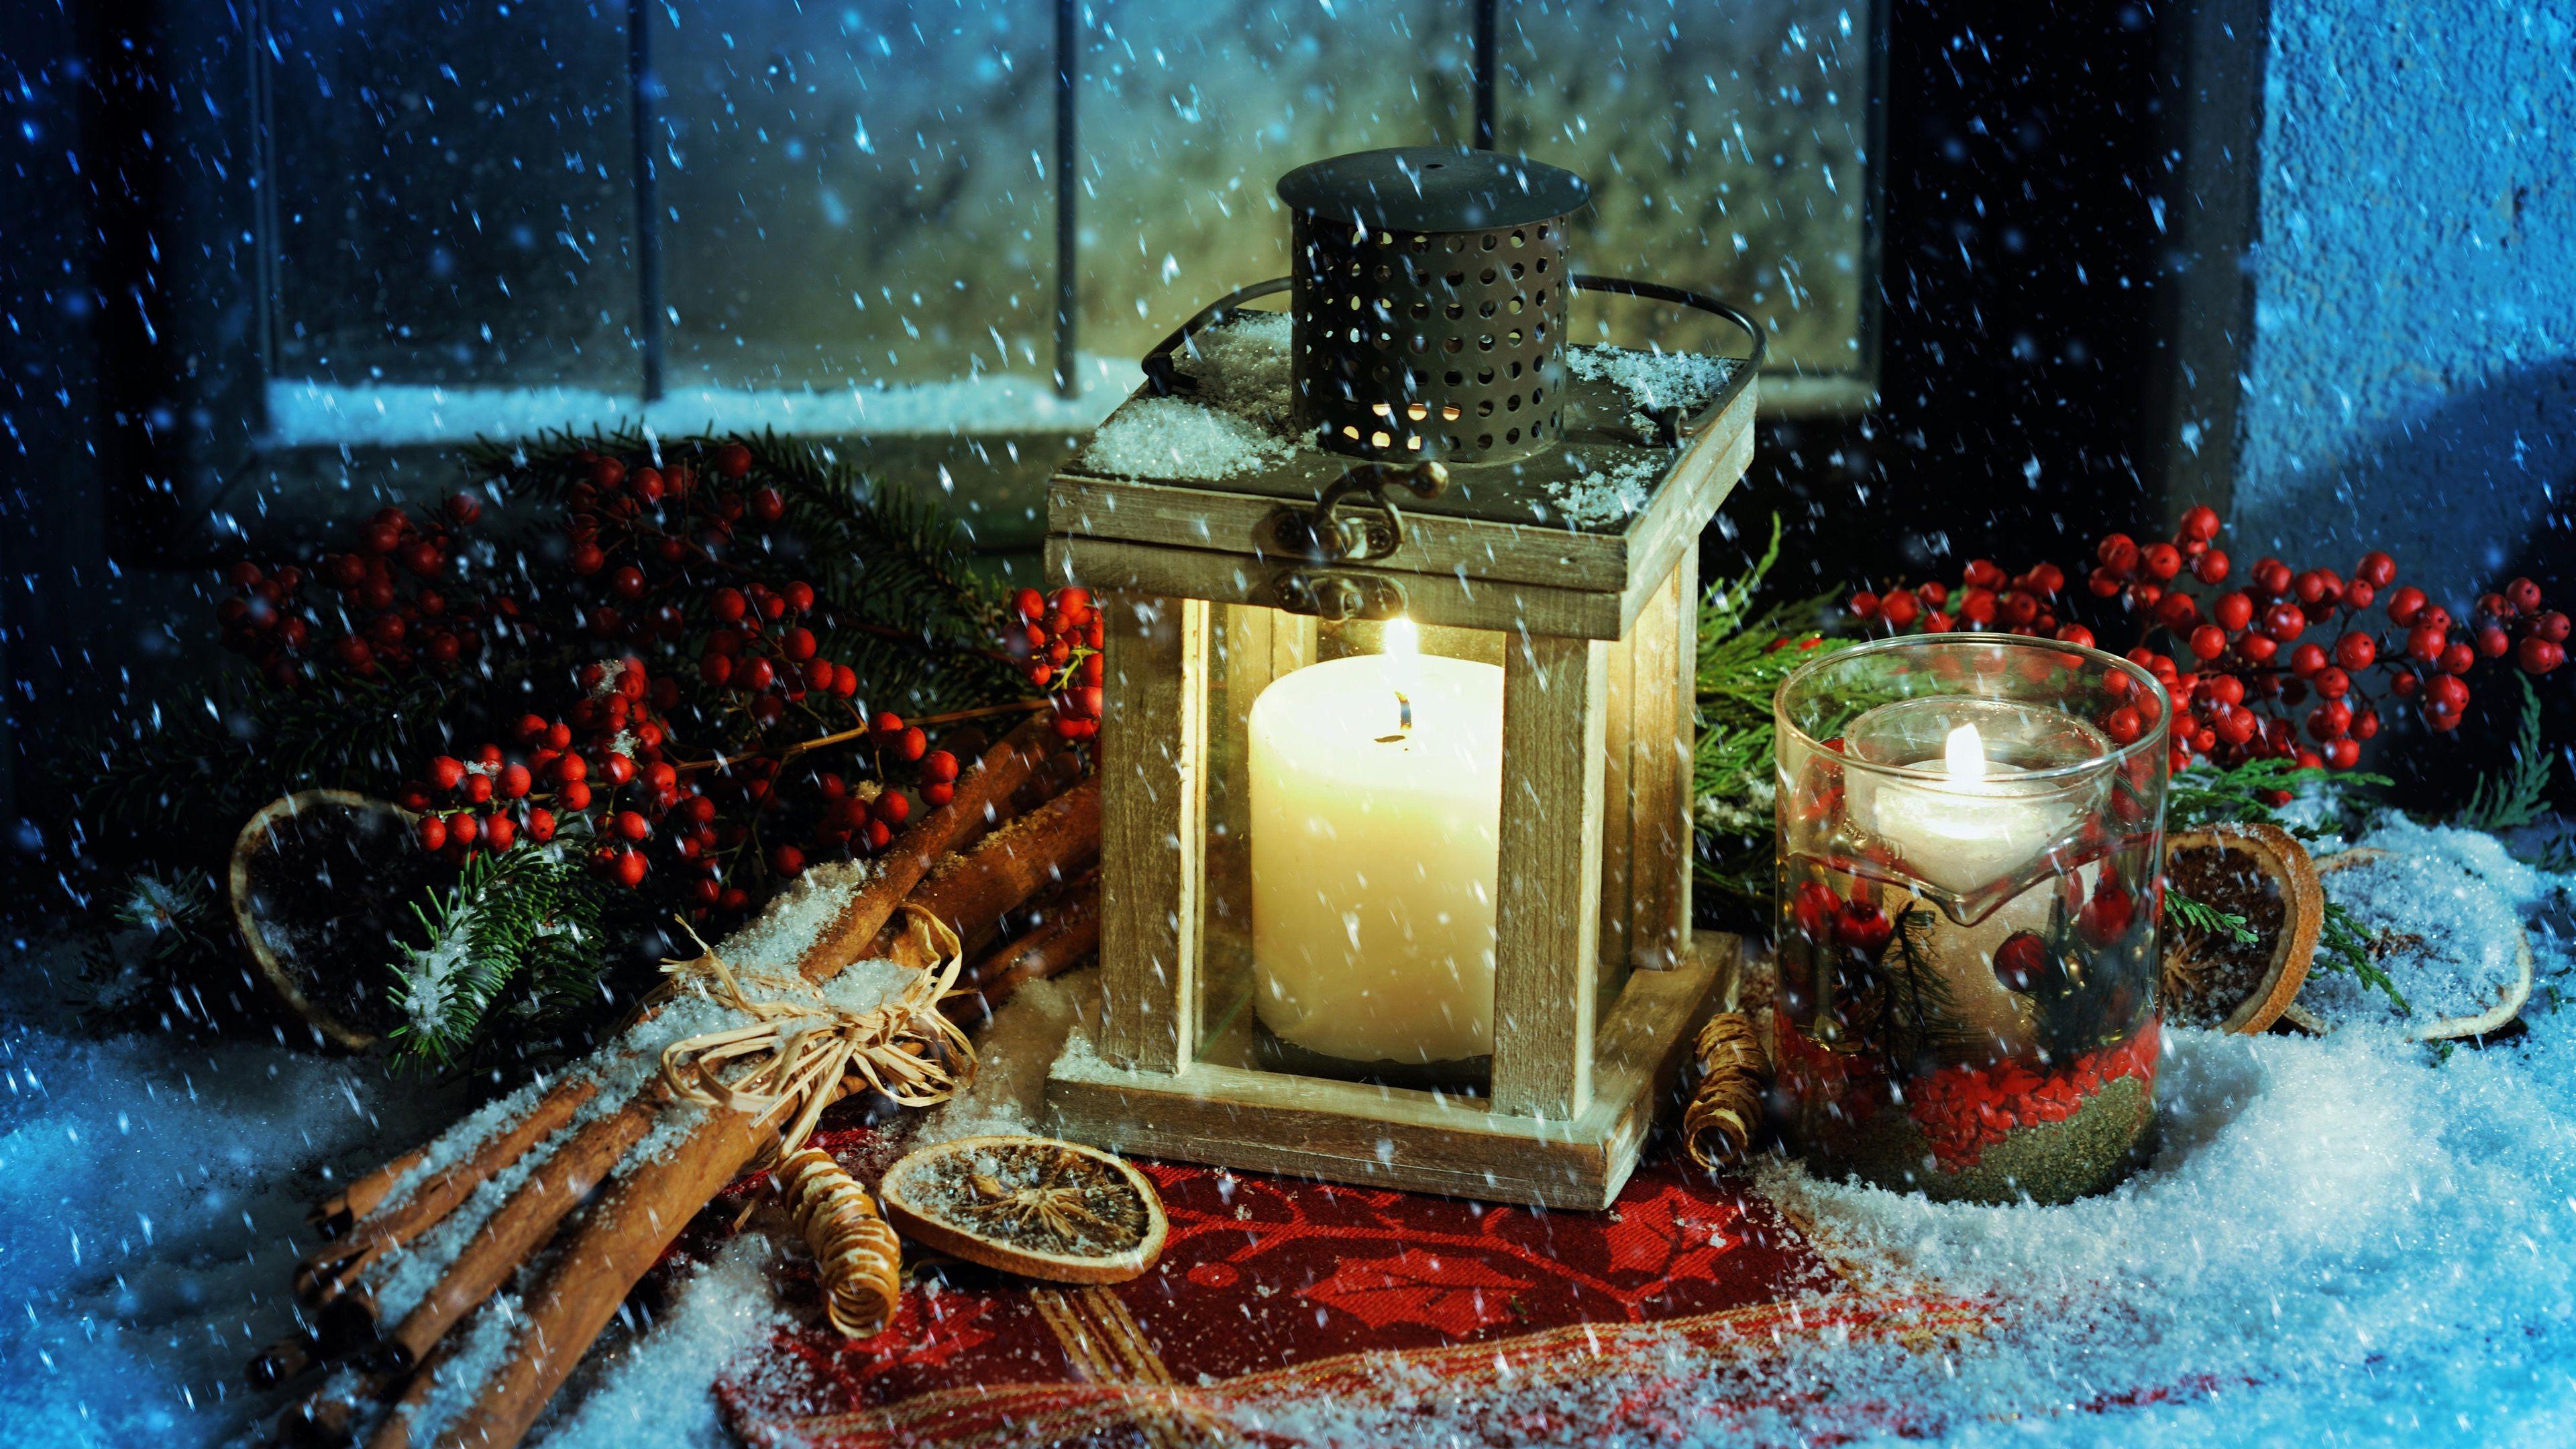 Noel Theme Lanterne Bougies Feu Neige Fonds D Ecran 3840x2160 Uhd 4k Decoration Hiver Livres De Noel Noel